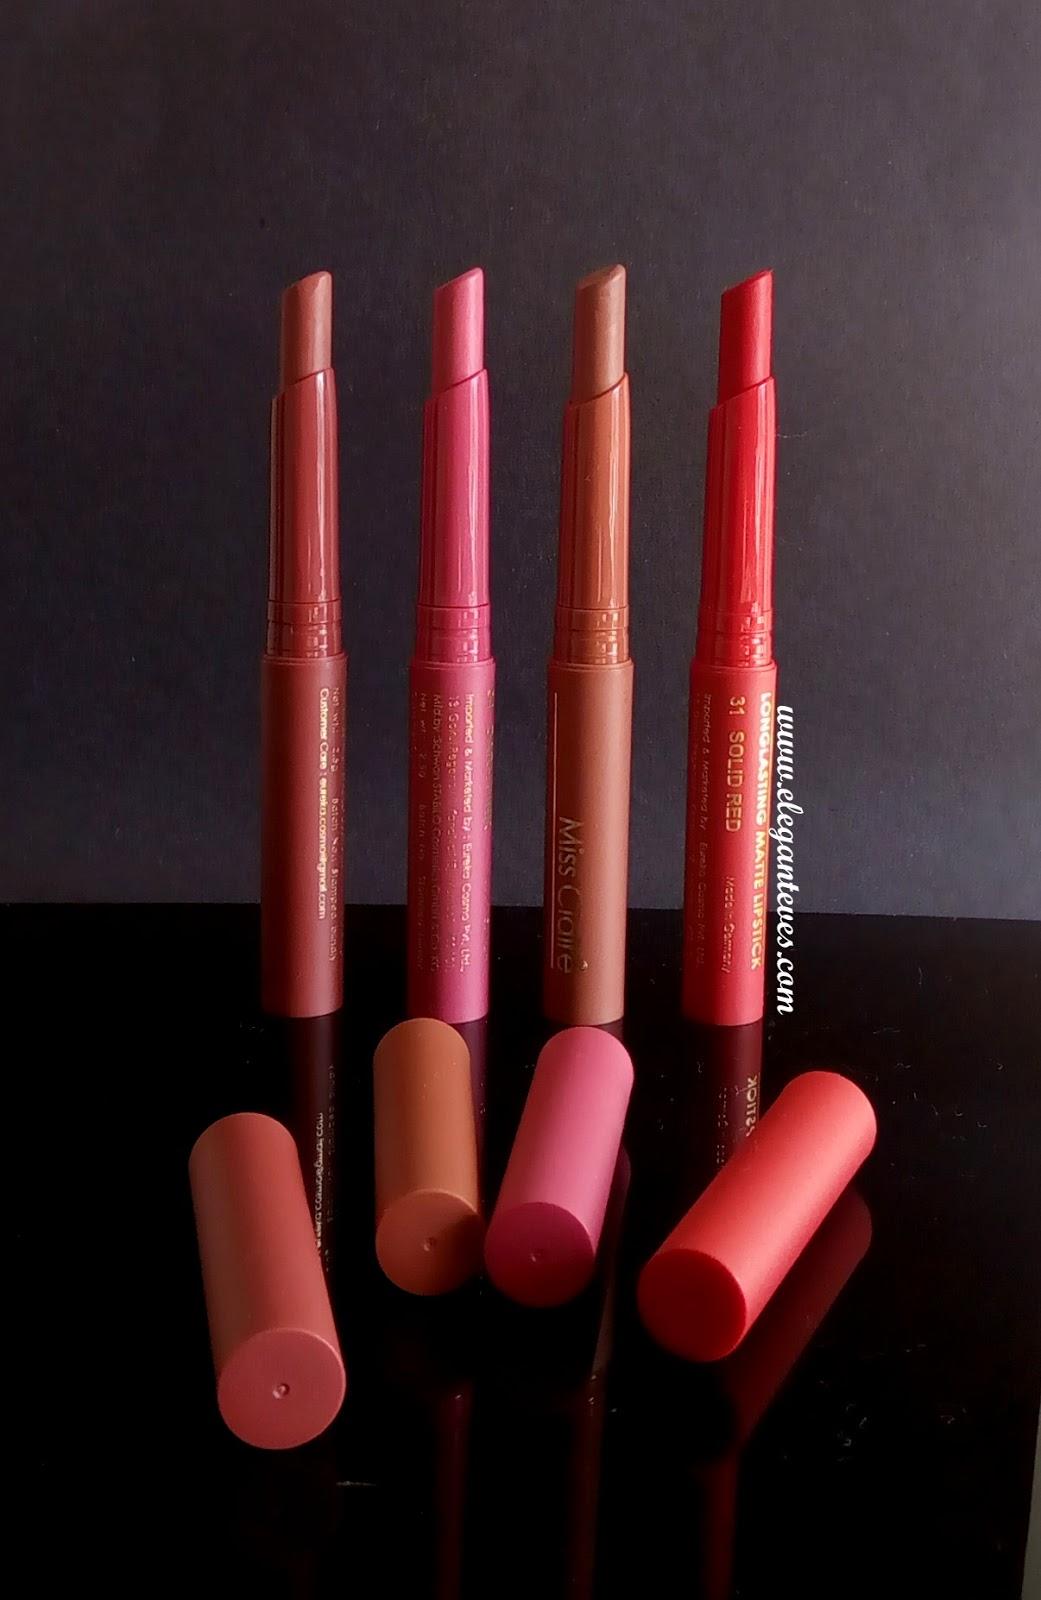 Long Lasting Exterior House Paint Colors Ideas: Review Of Miss Claire Long Lasting Matte Lipsticks